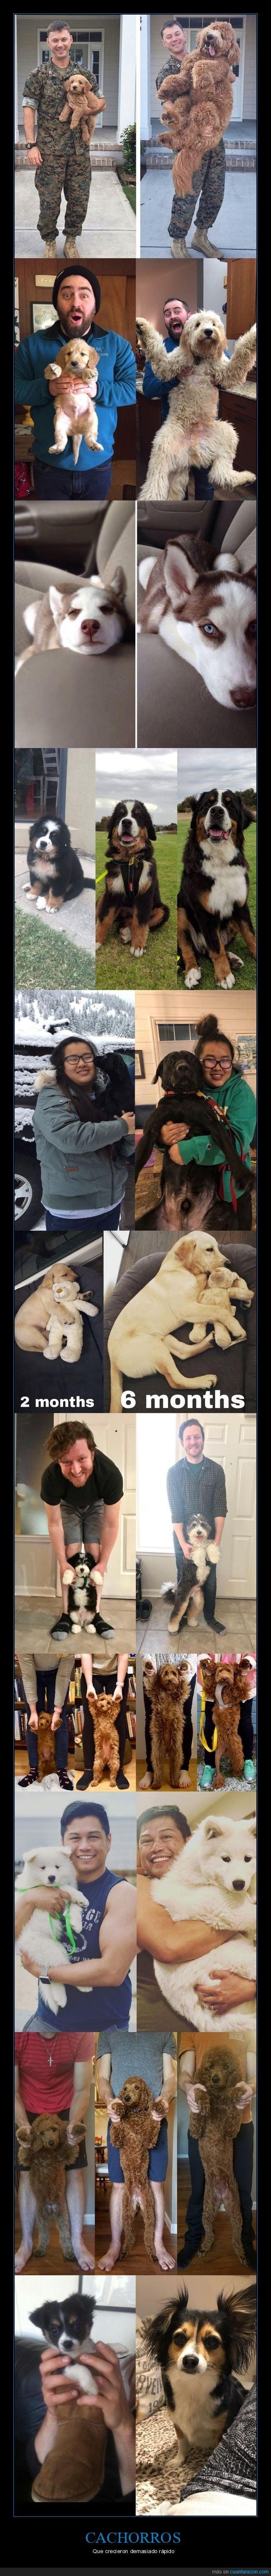 cachorros,crecer,perros